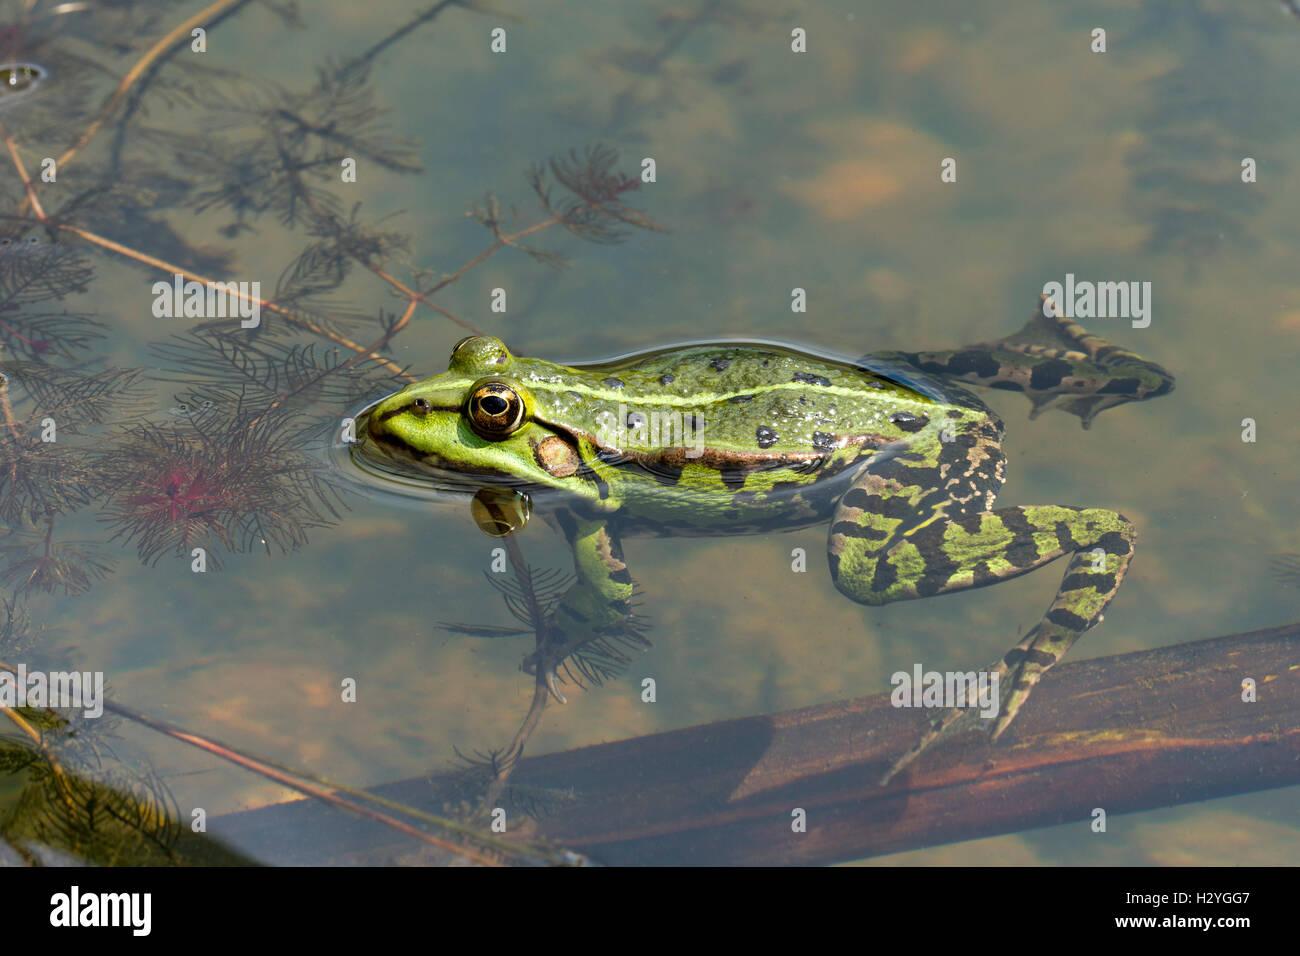 Edible frog (Rana esculenta), water, Burgenland, Austria - Stock Image